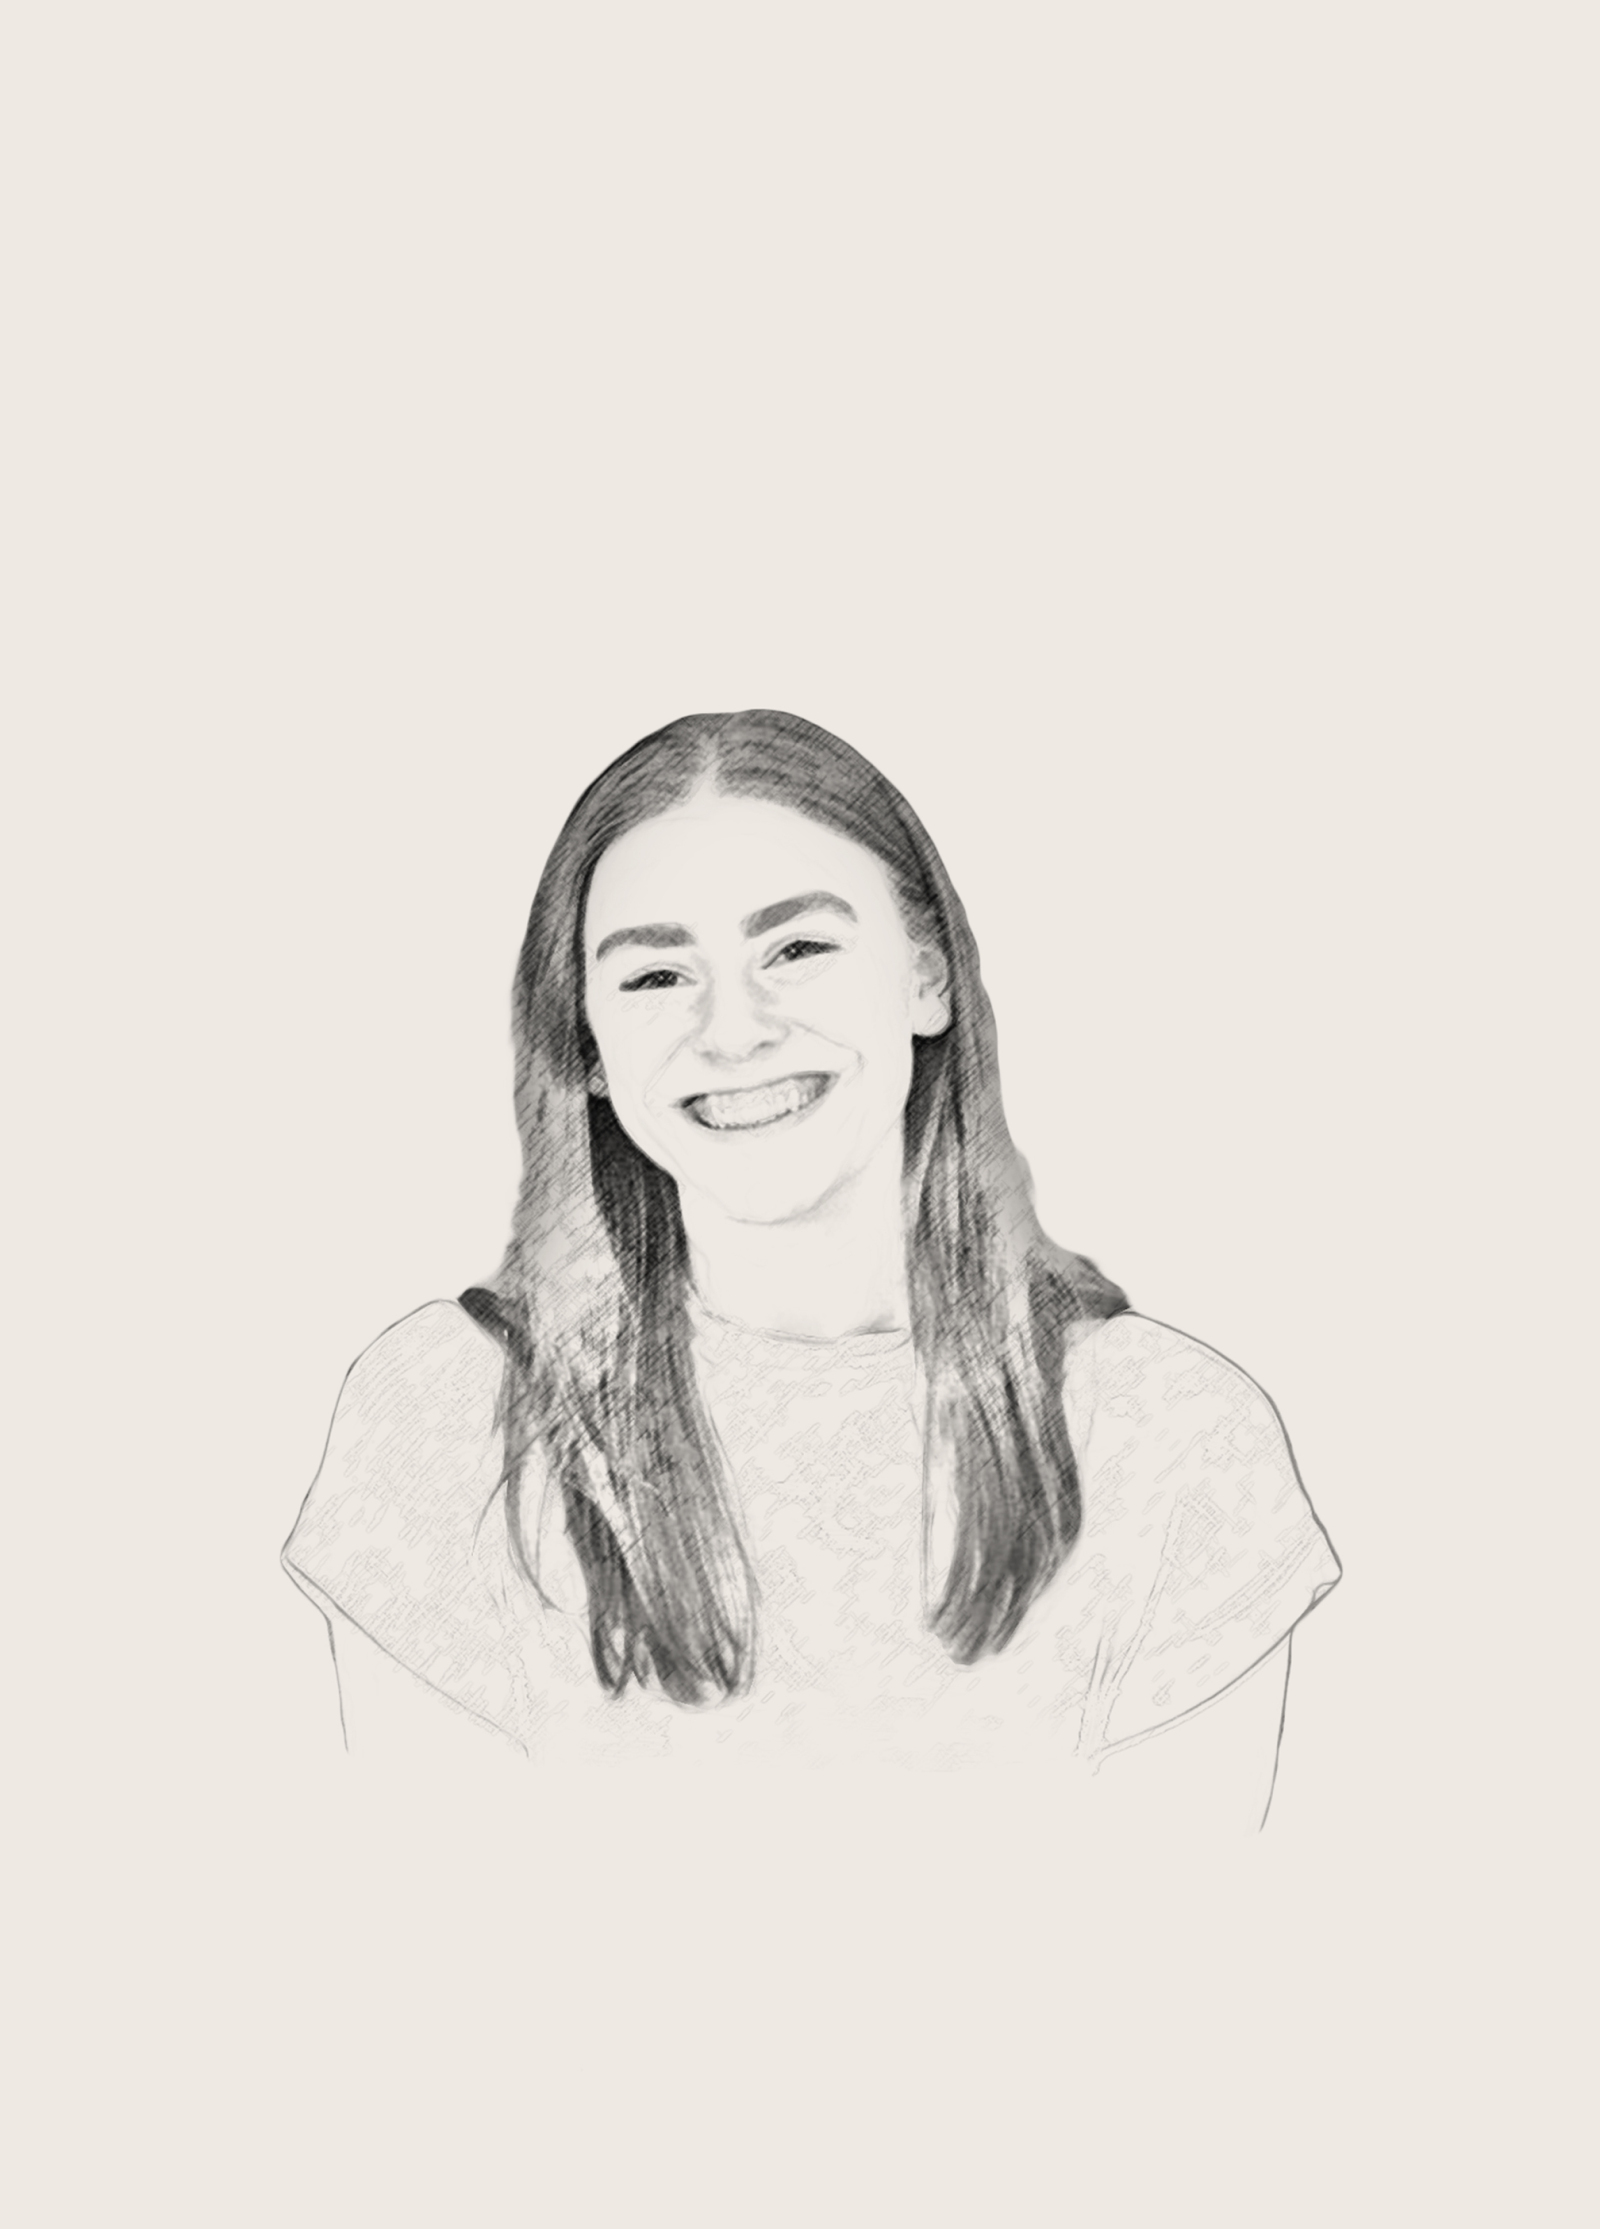 Saoirse_Sketch.jpg